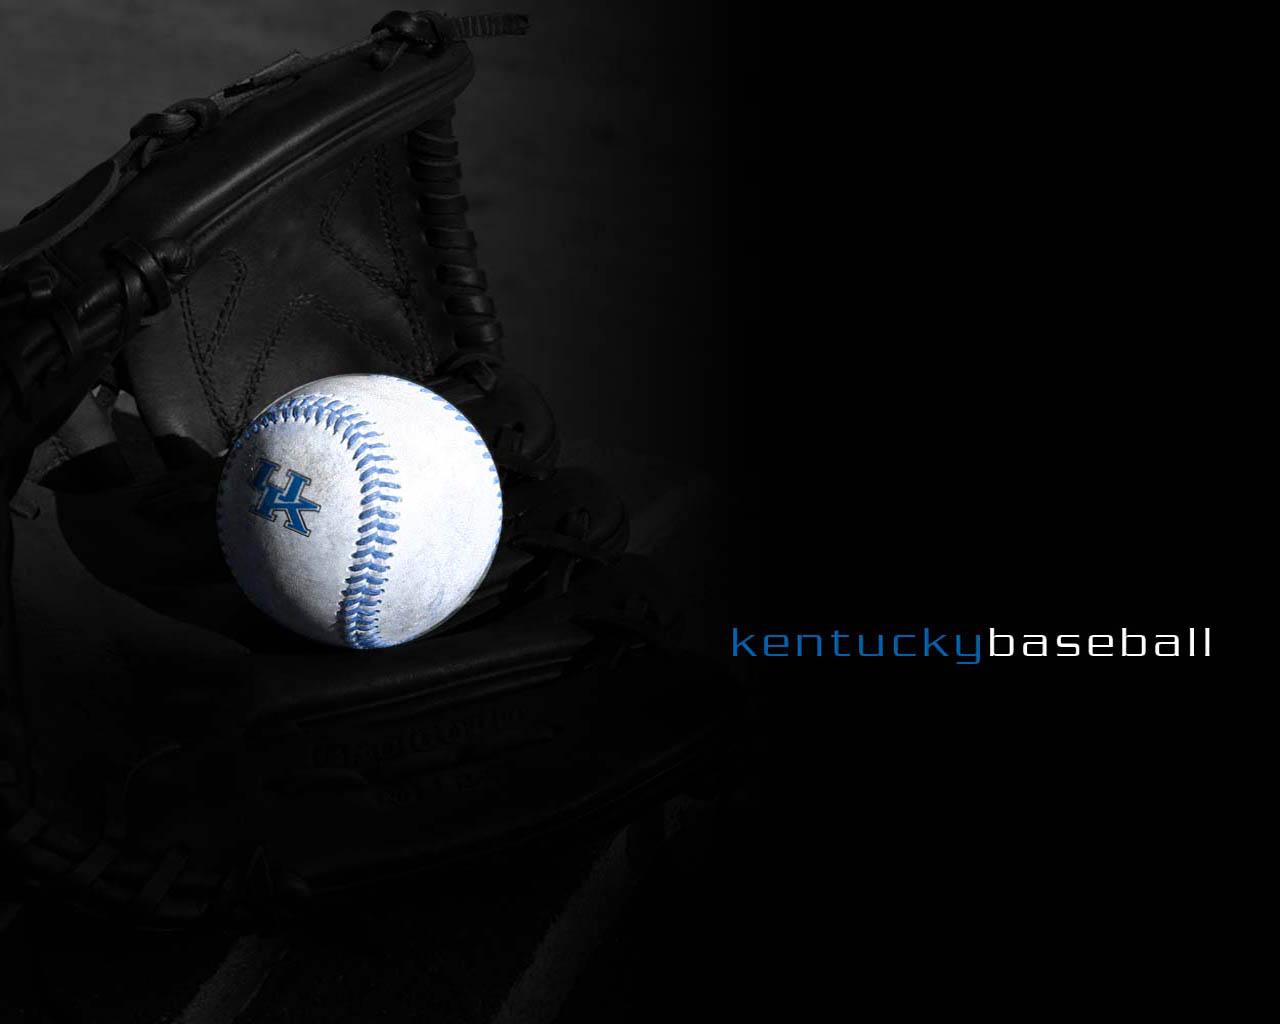 Baseball wallpapers | xc 4